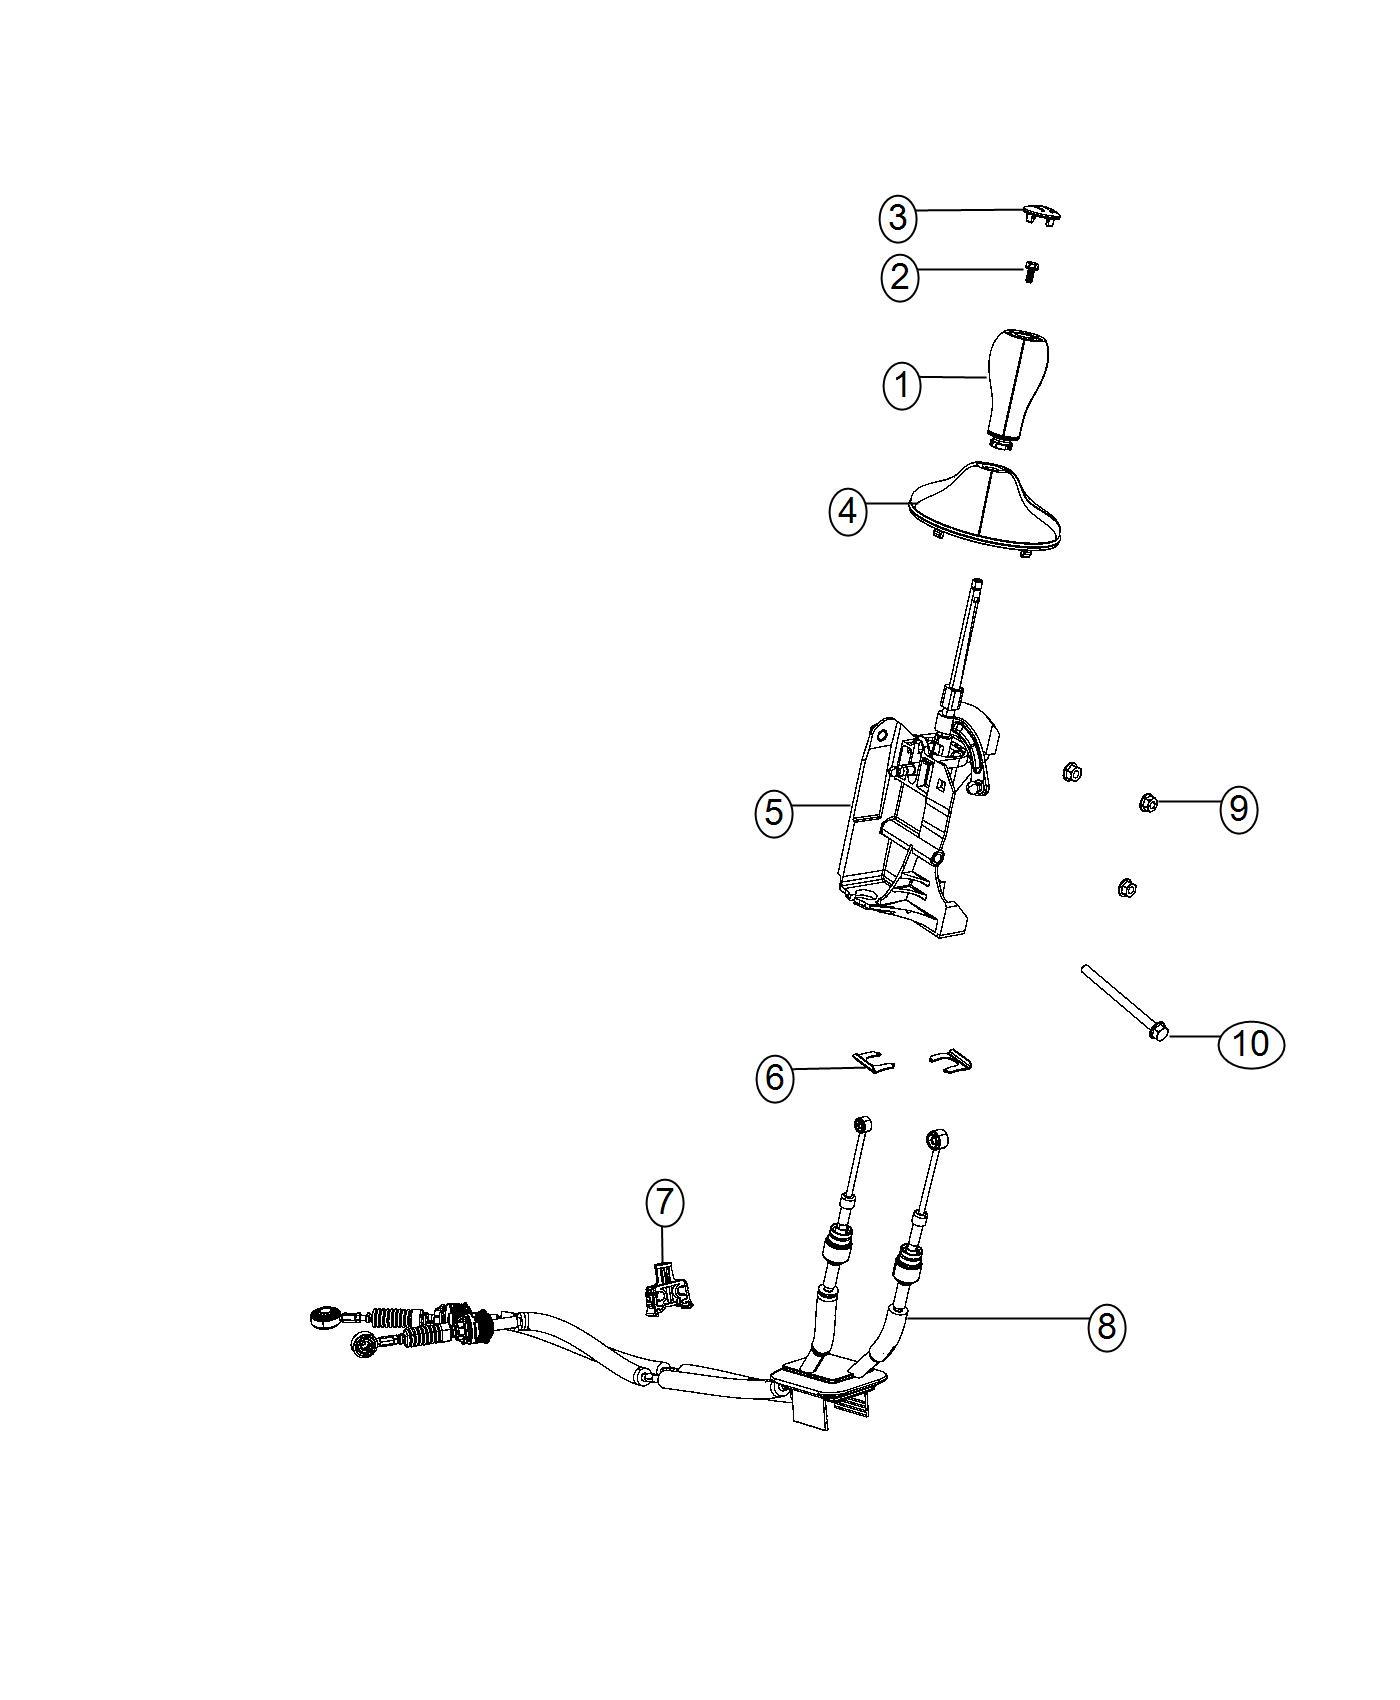 Fiat 500 Shifter Transmission Rating Horsepower Knob